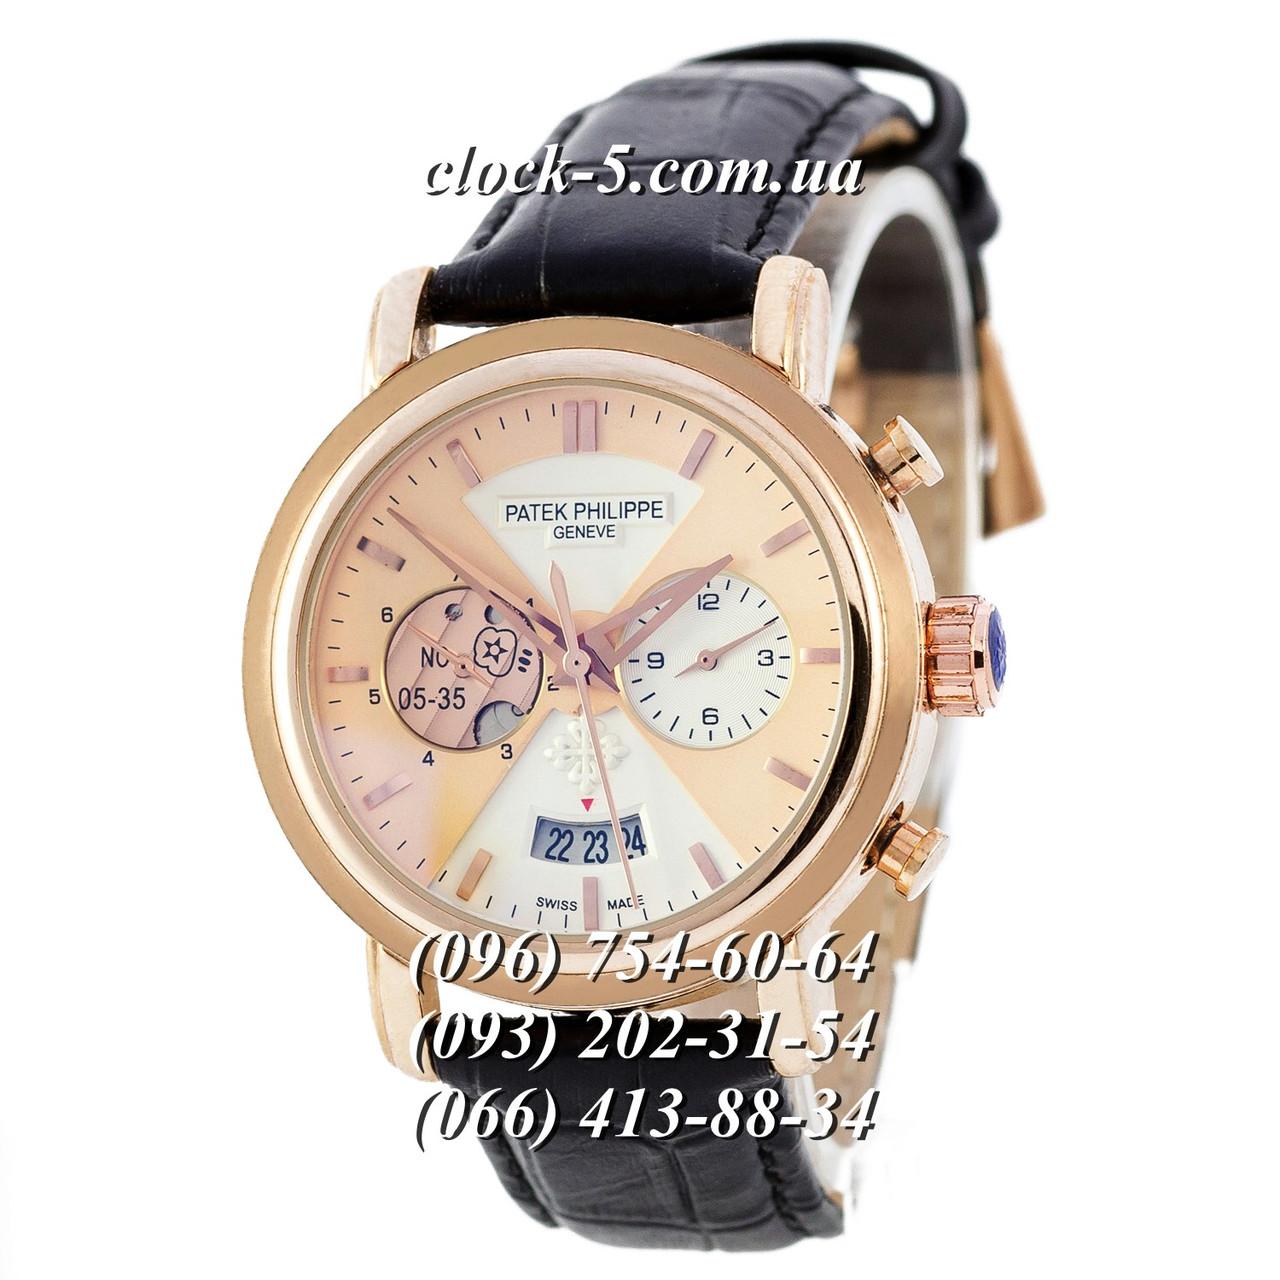 Наручные часы sky купить часы casio b640wb